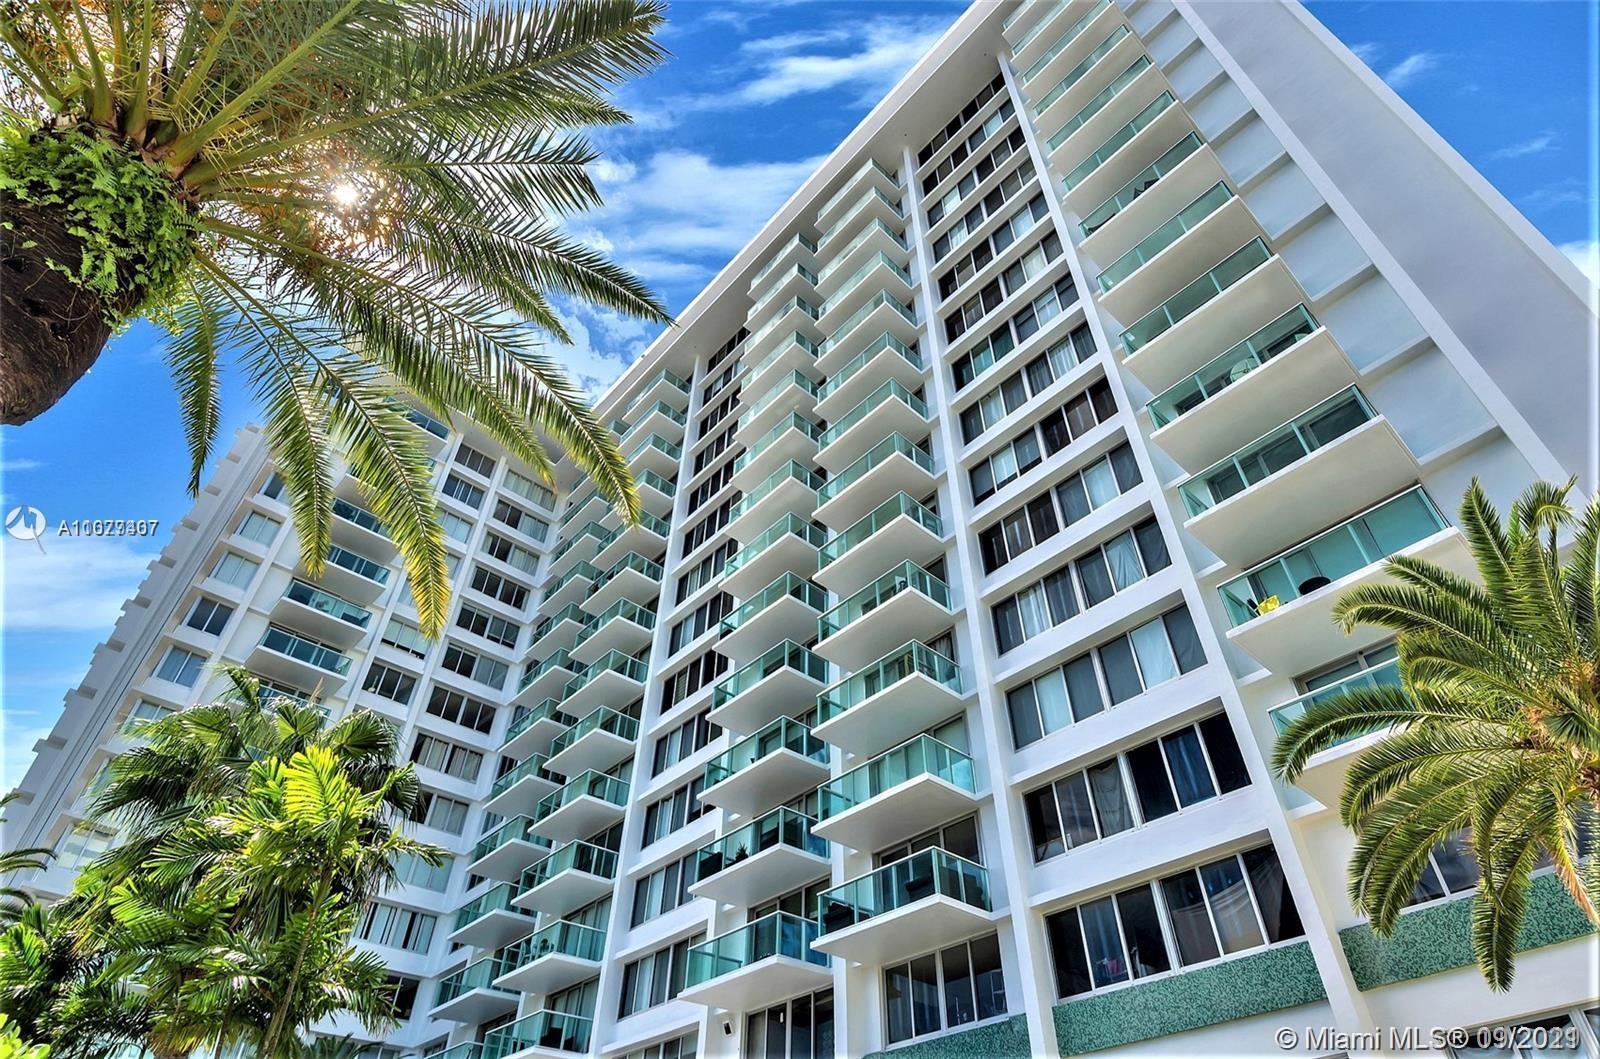 Mirador South #526 - 1000 West Ave #526, Miami Beach, FL 33139